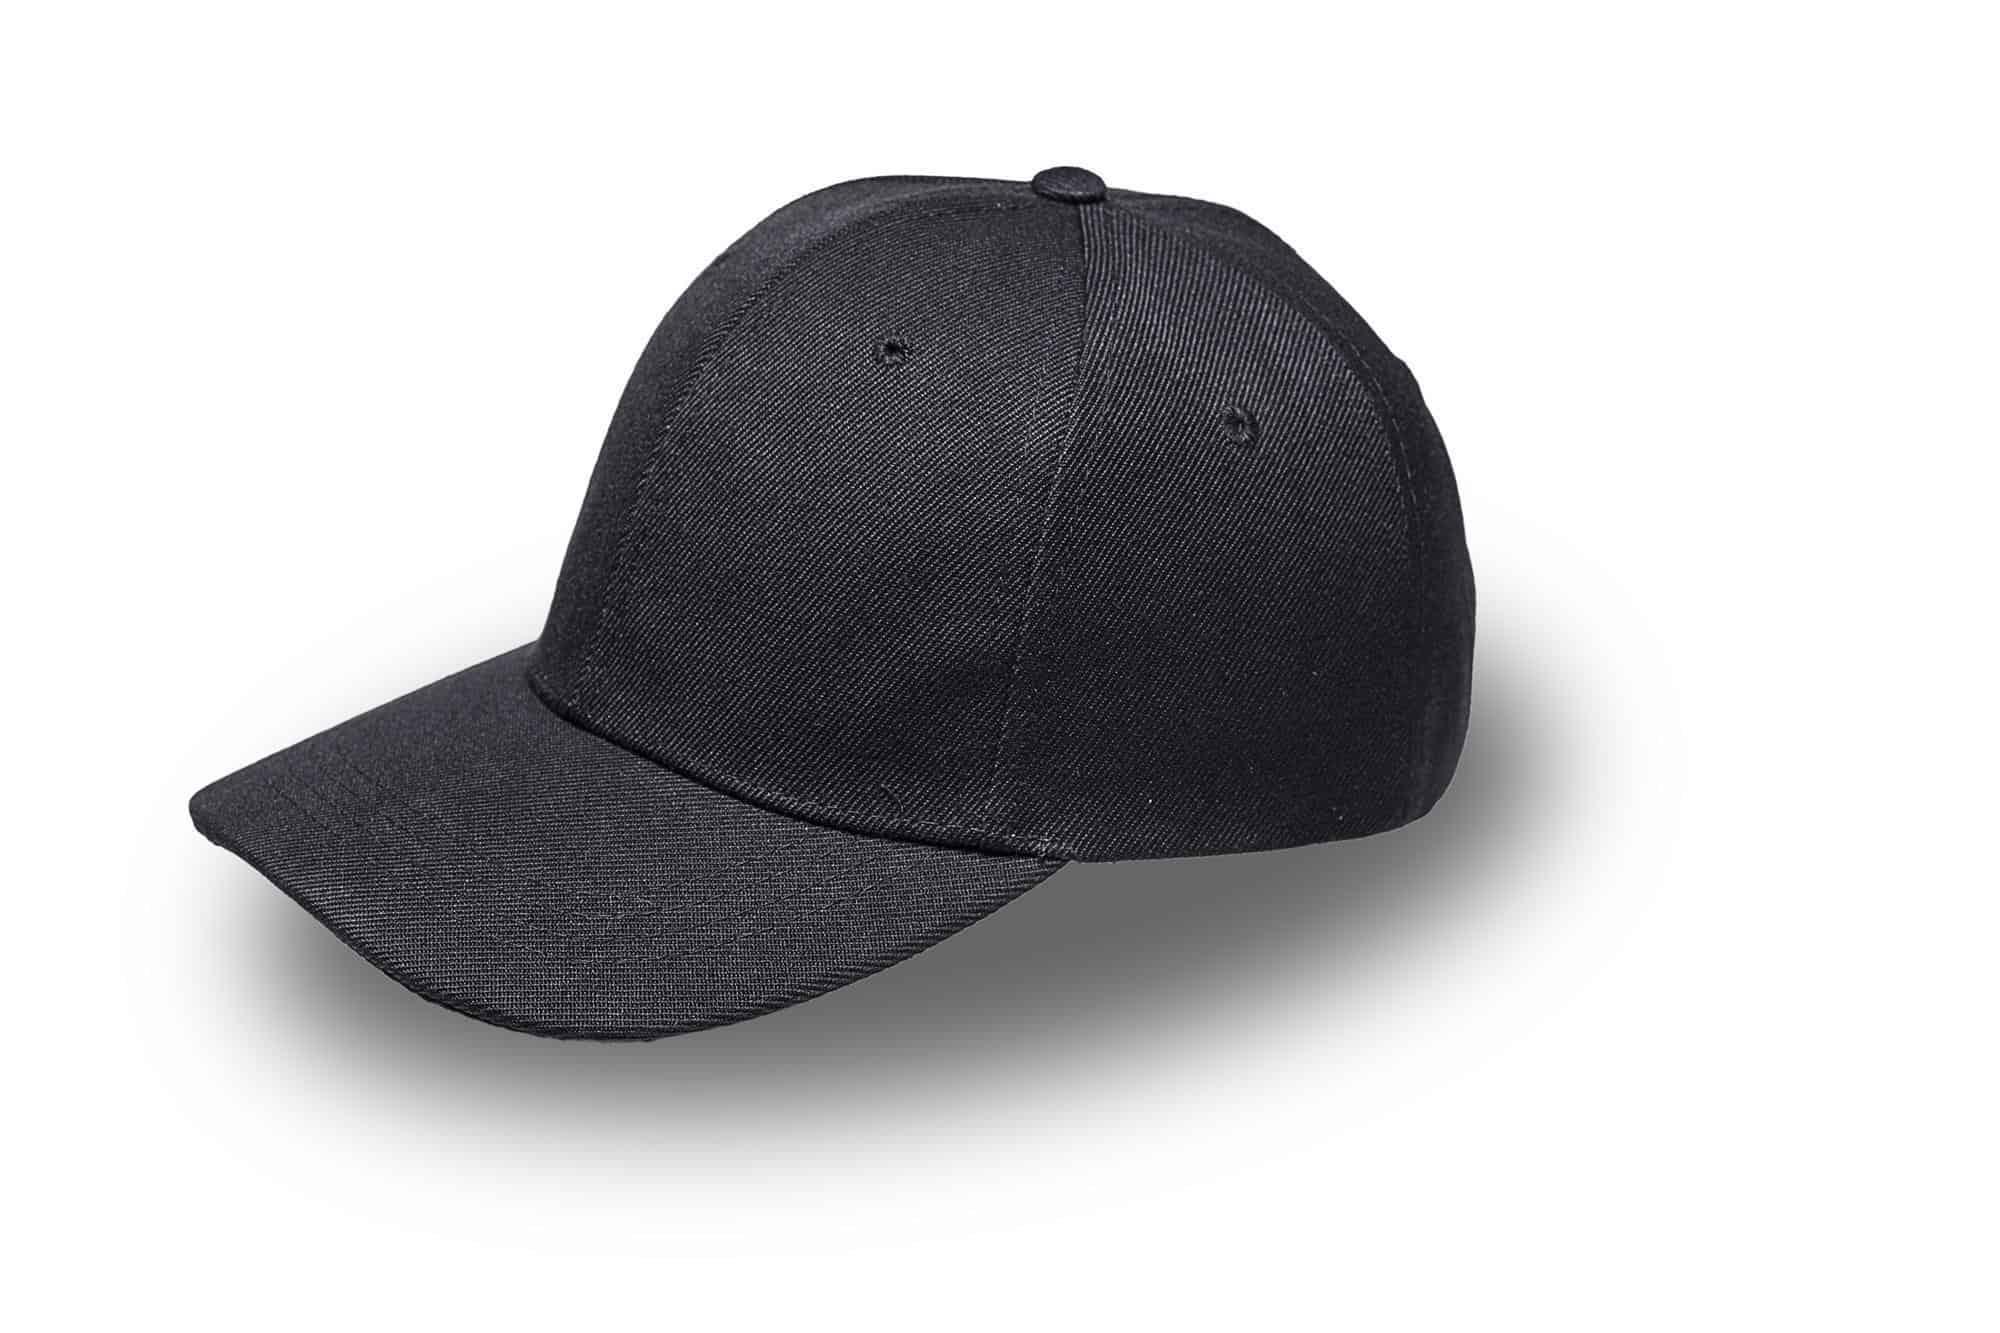 Value Fade Resistant Cap Headwear and Accessories